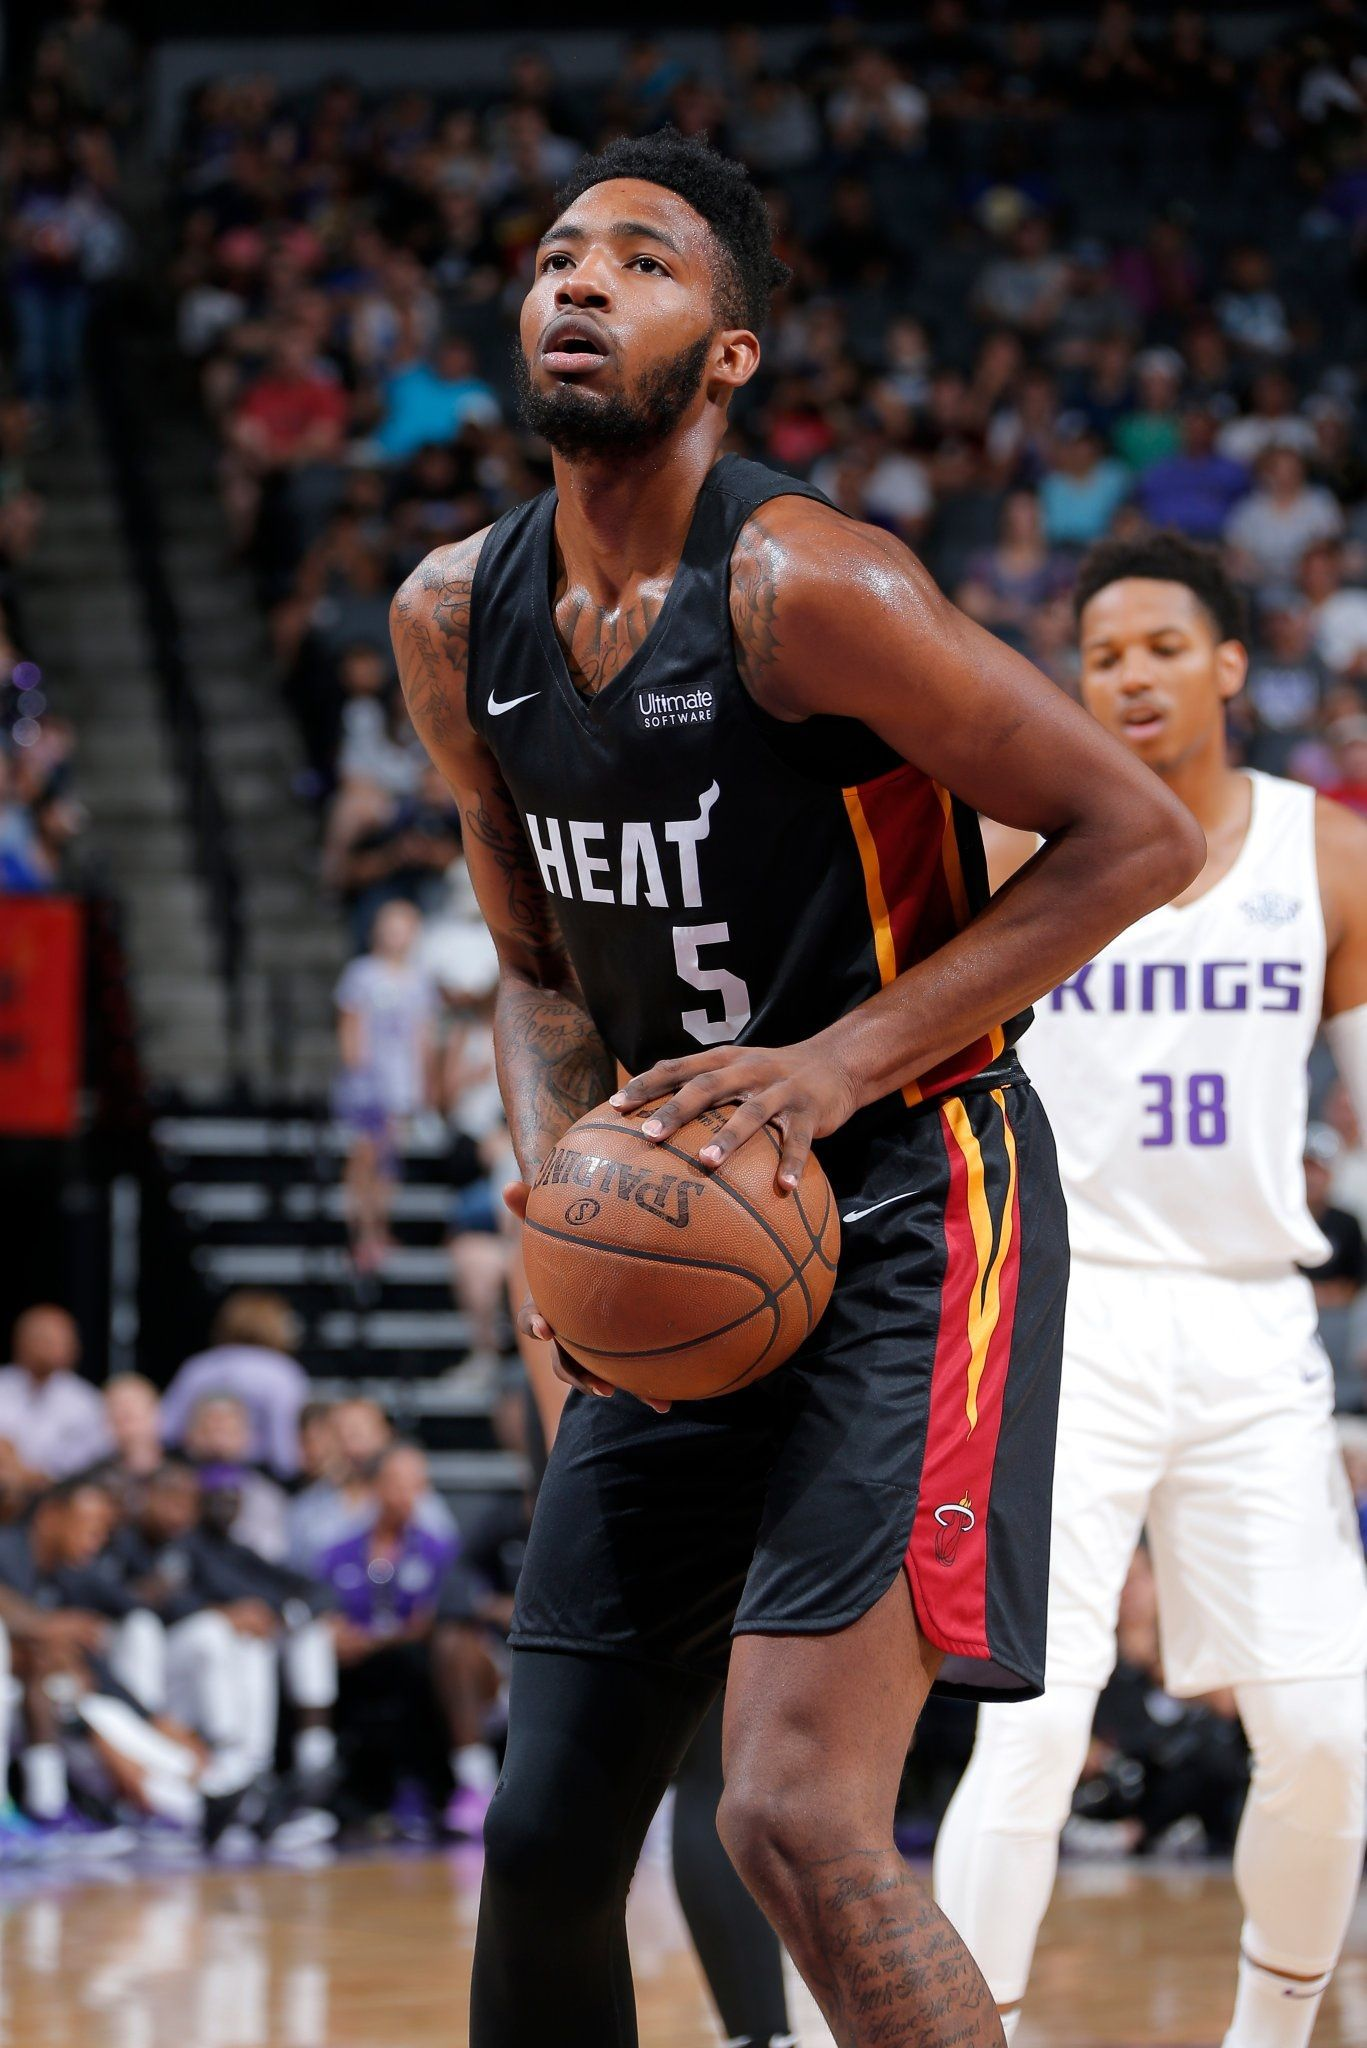 Derrick Jones Jr. Nba players, Miami heat, Players